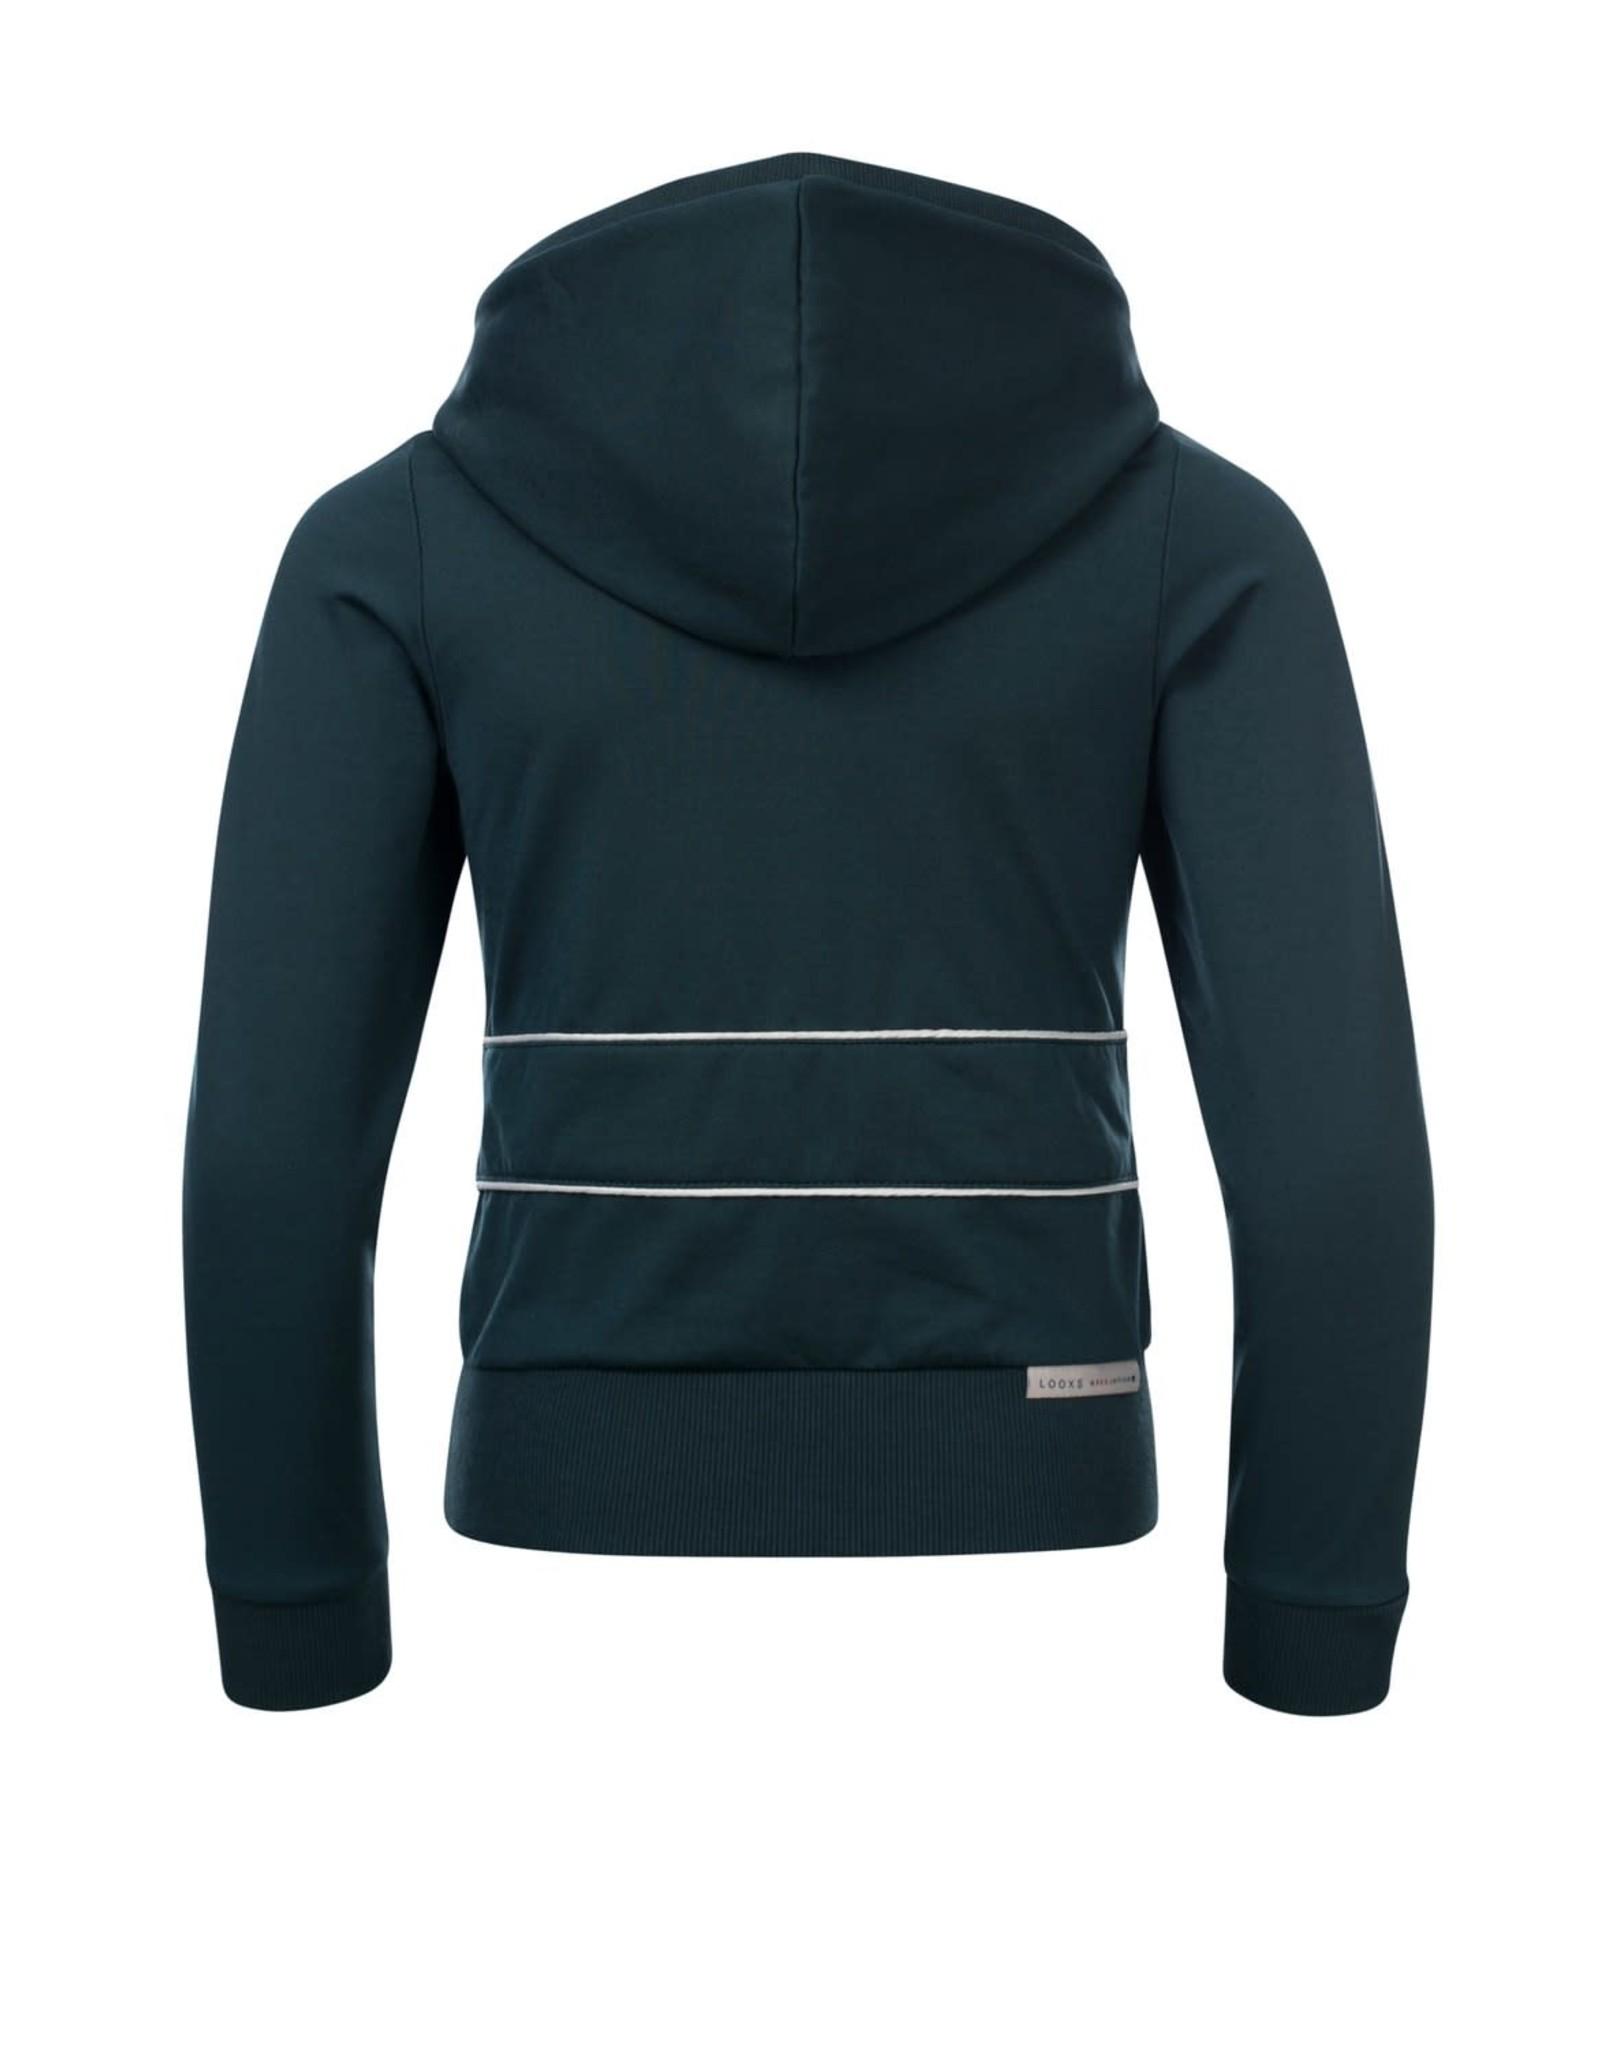 Looxs Girls hoody sweater Lagoon